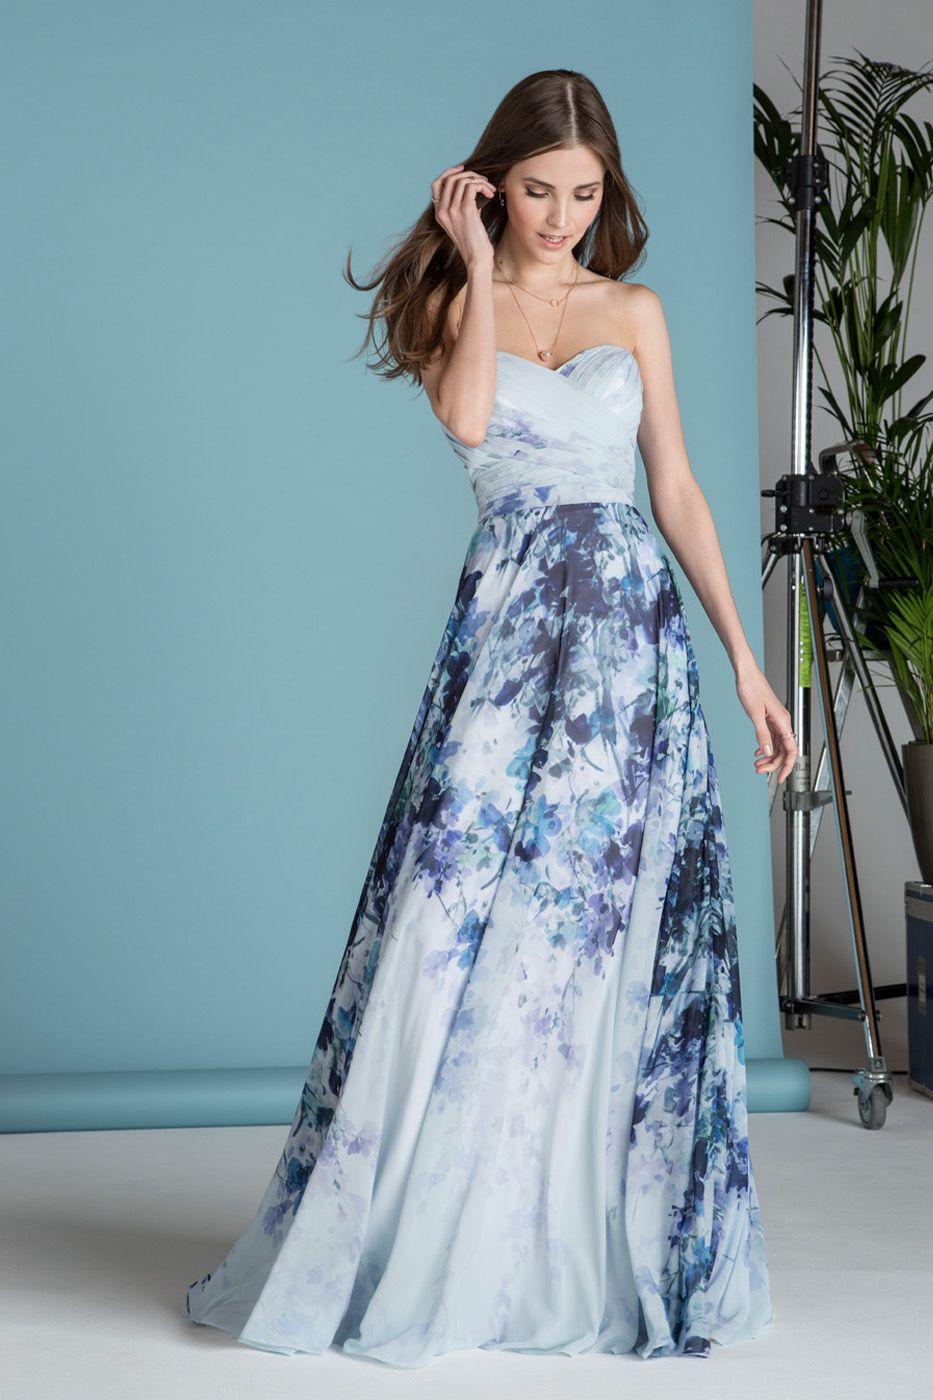 kelseyrose2018   Printing   Pinterest   Floral chiffon, Floral and Rose